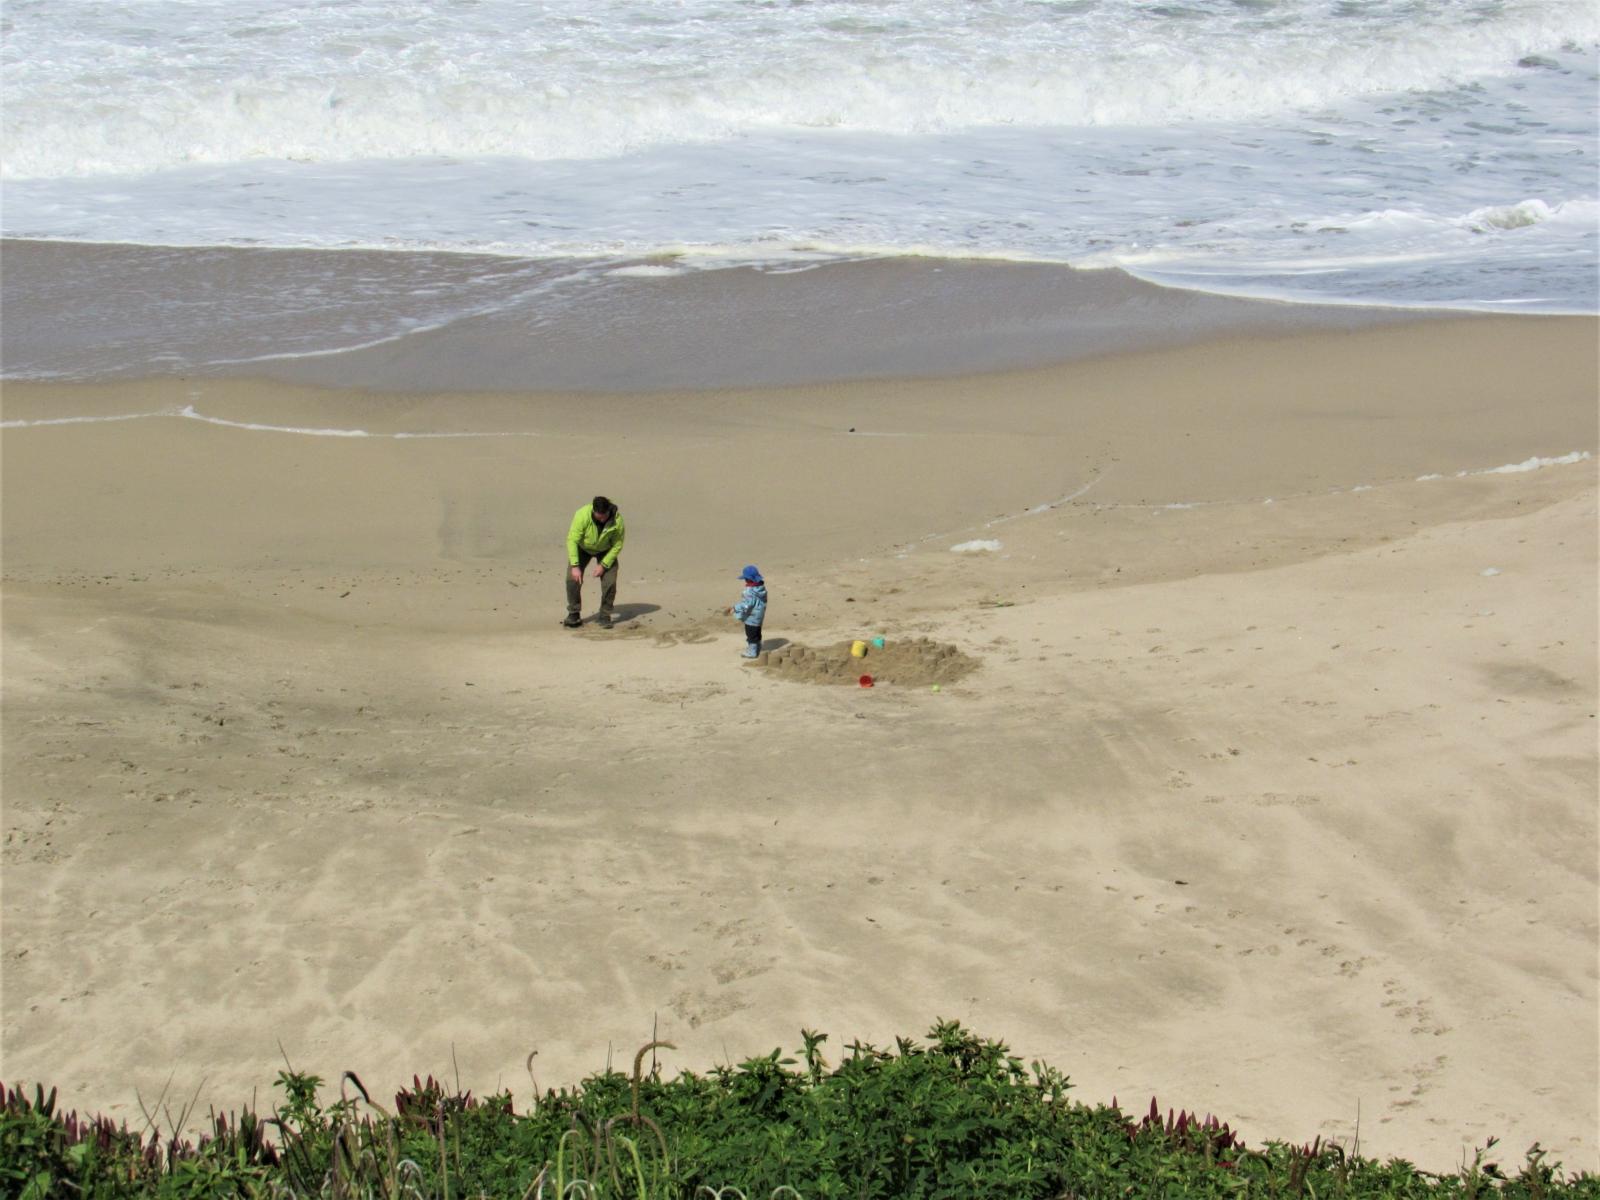 Sandcastle2